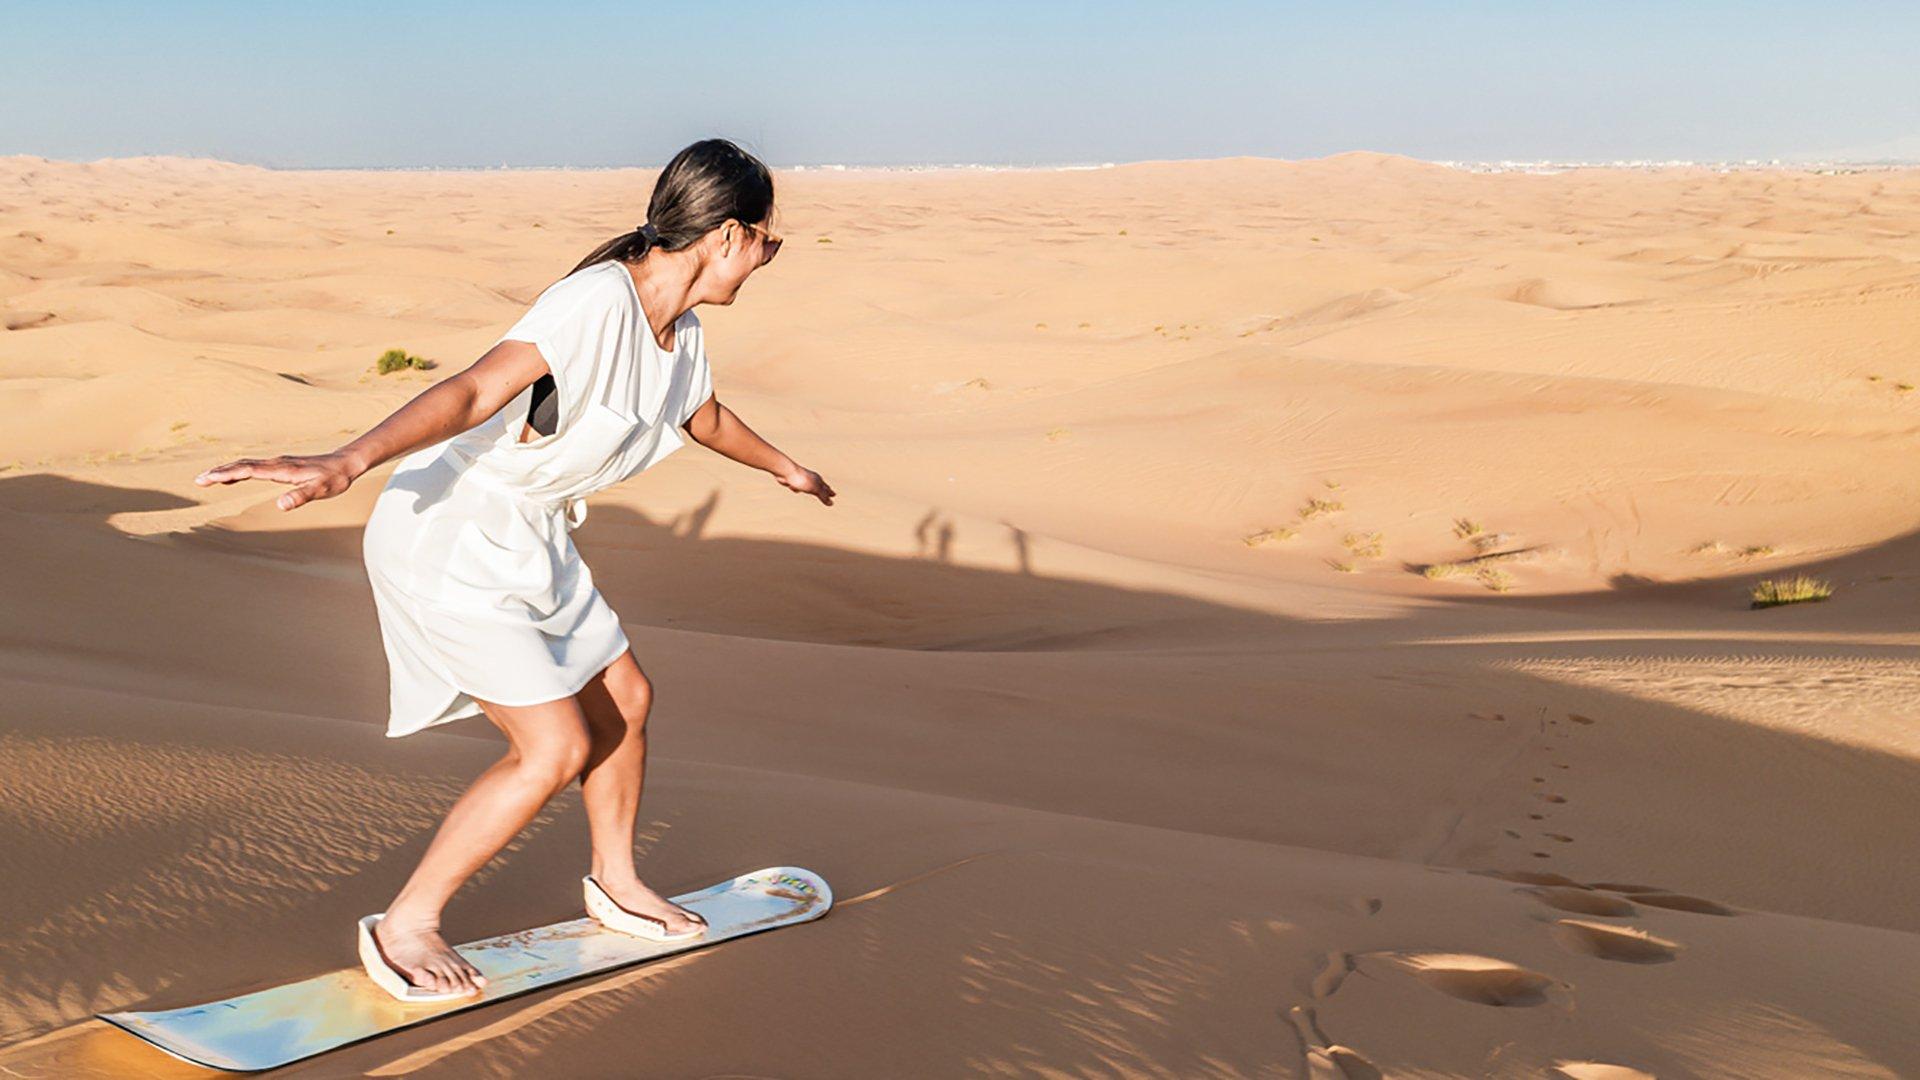 Red Dune Safari, Quad Bike, Sandboarding & Camel Ride Experience From Dubai_101_2